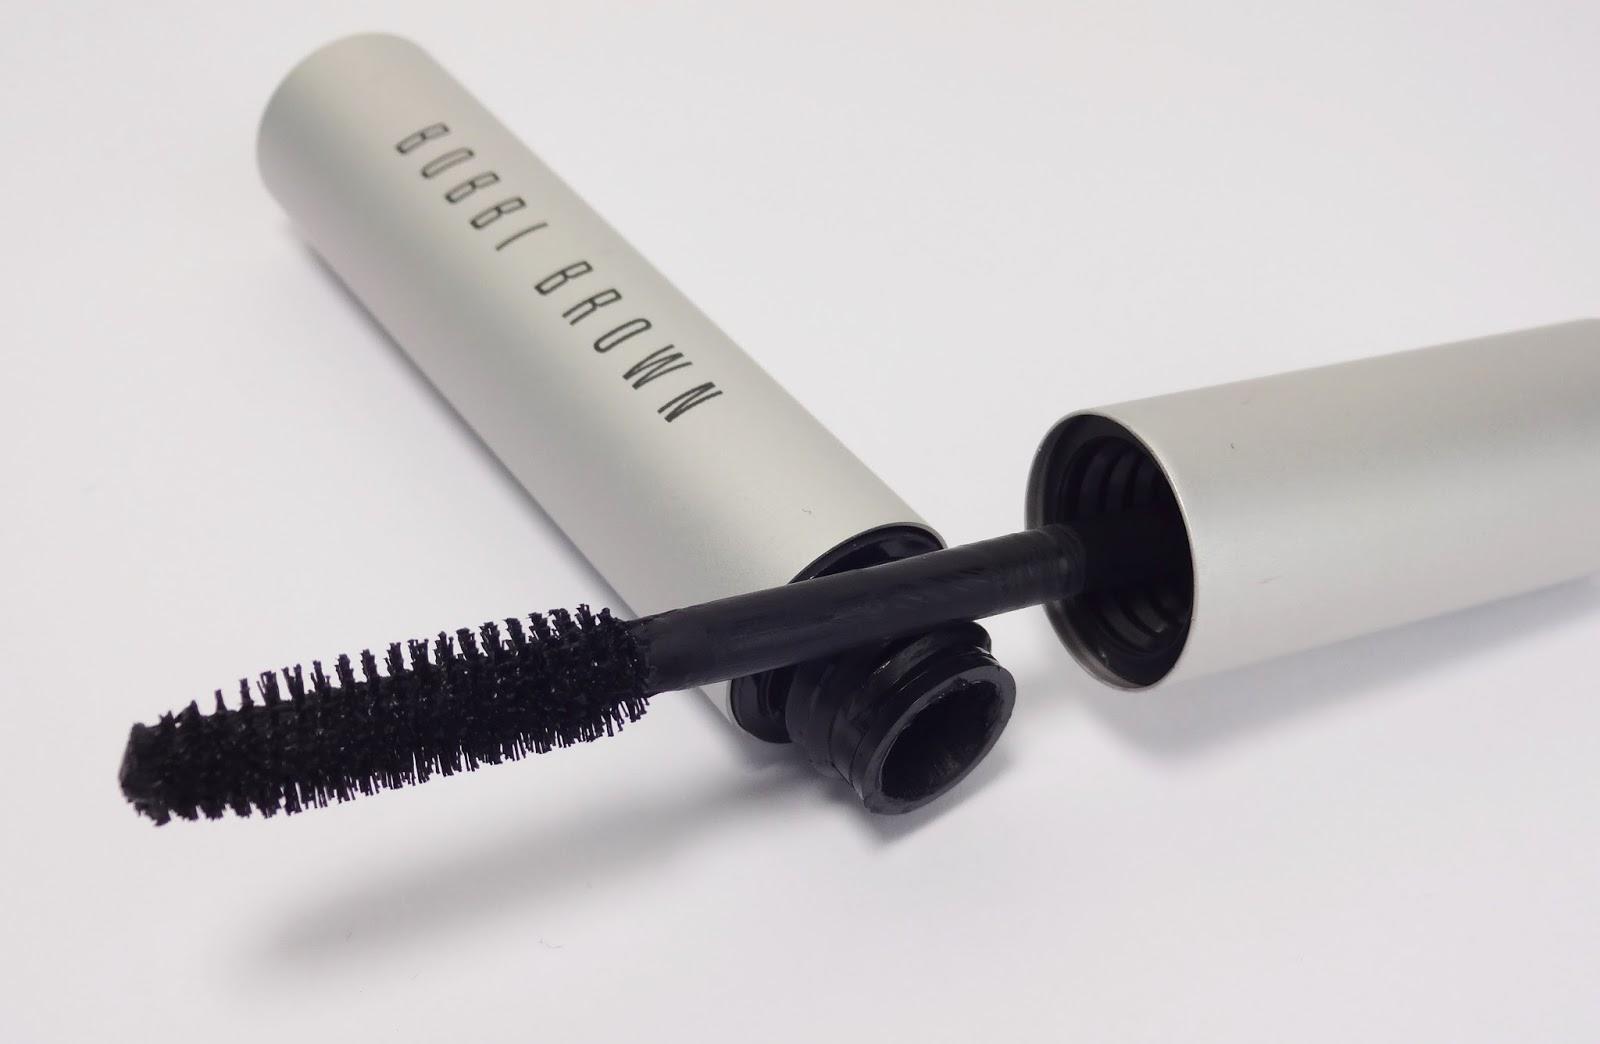 Bobbi Brown - Smokey Eye Mascara Pretty Clover Beautyblog Review